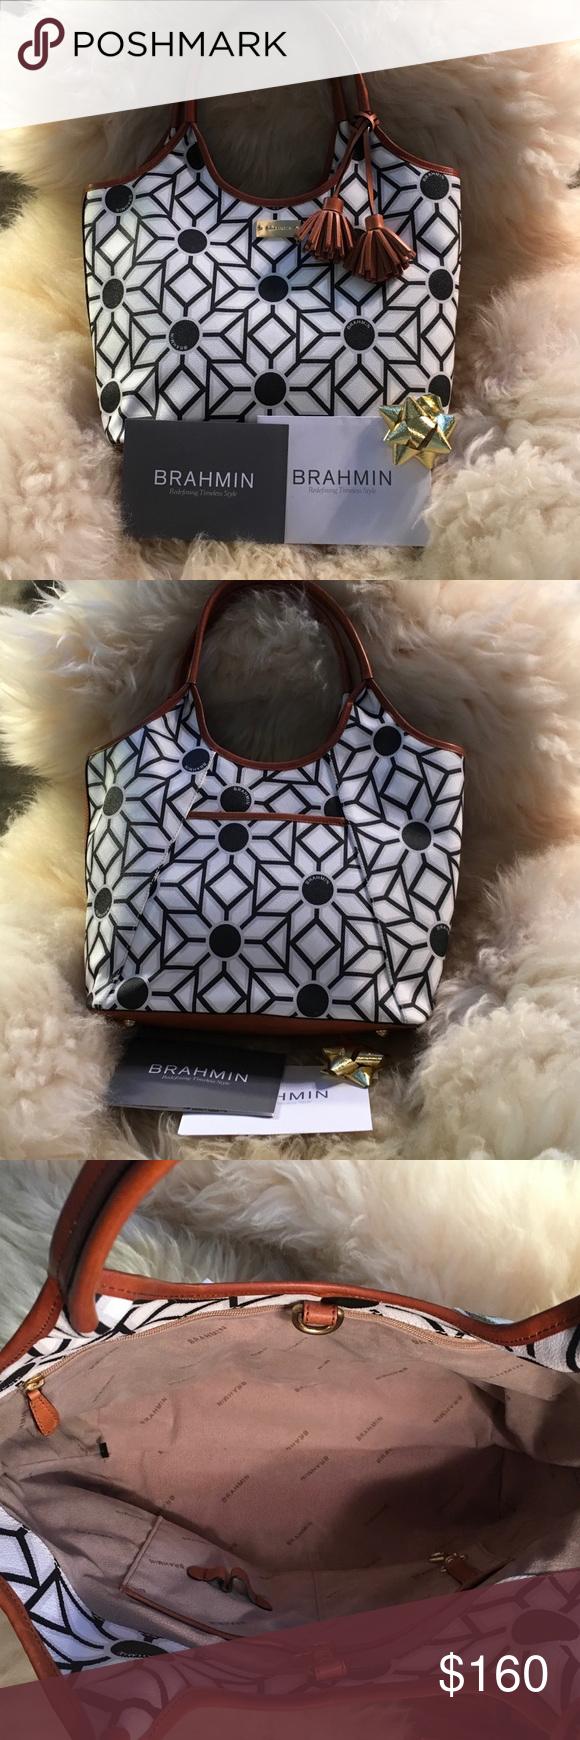 Spotted while shopping on Poshmark  BRAHMIN Leather KALEIDOSCOPE Bag. NWT!   poshmark   007b338a24